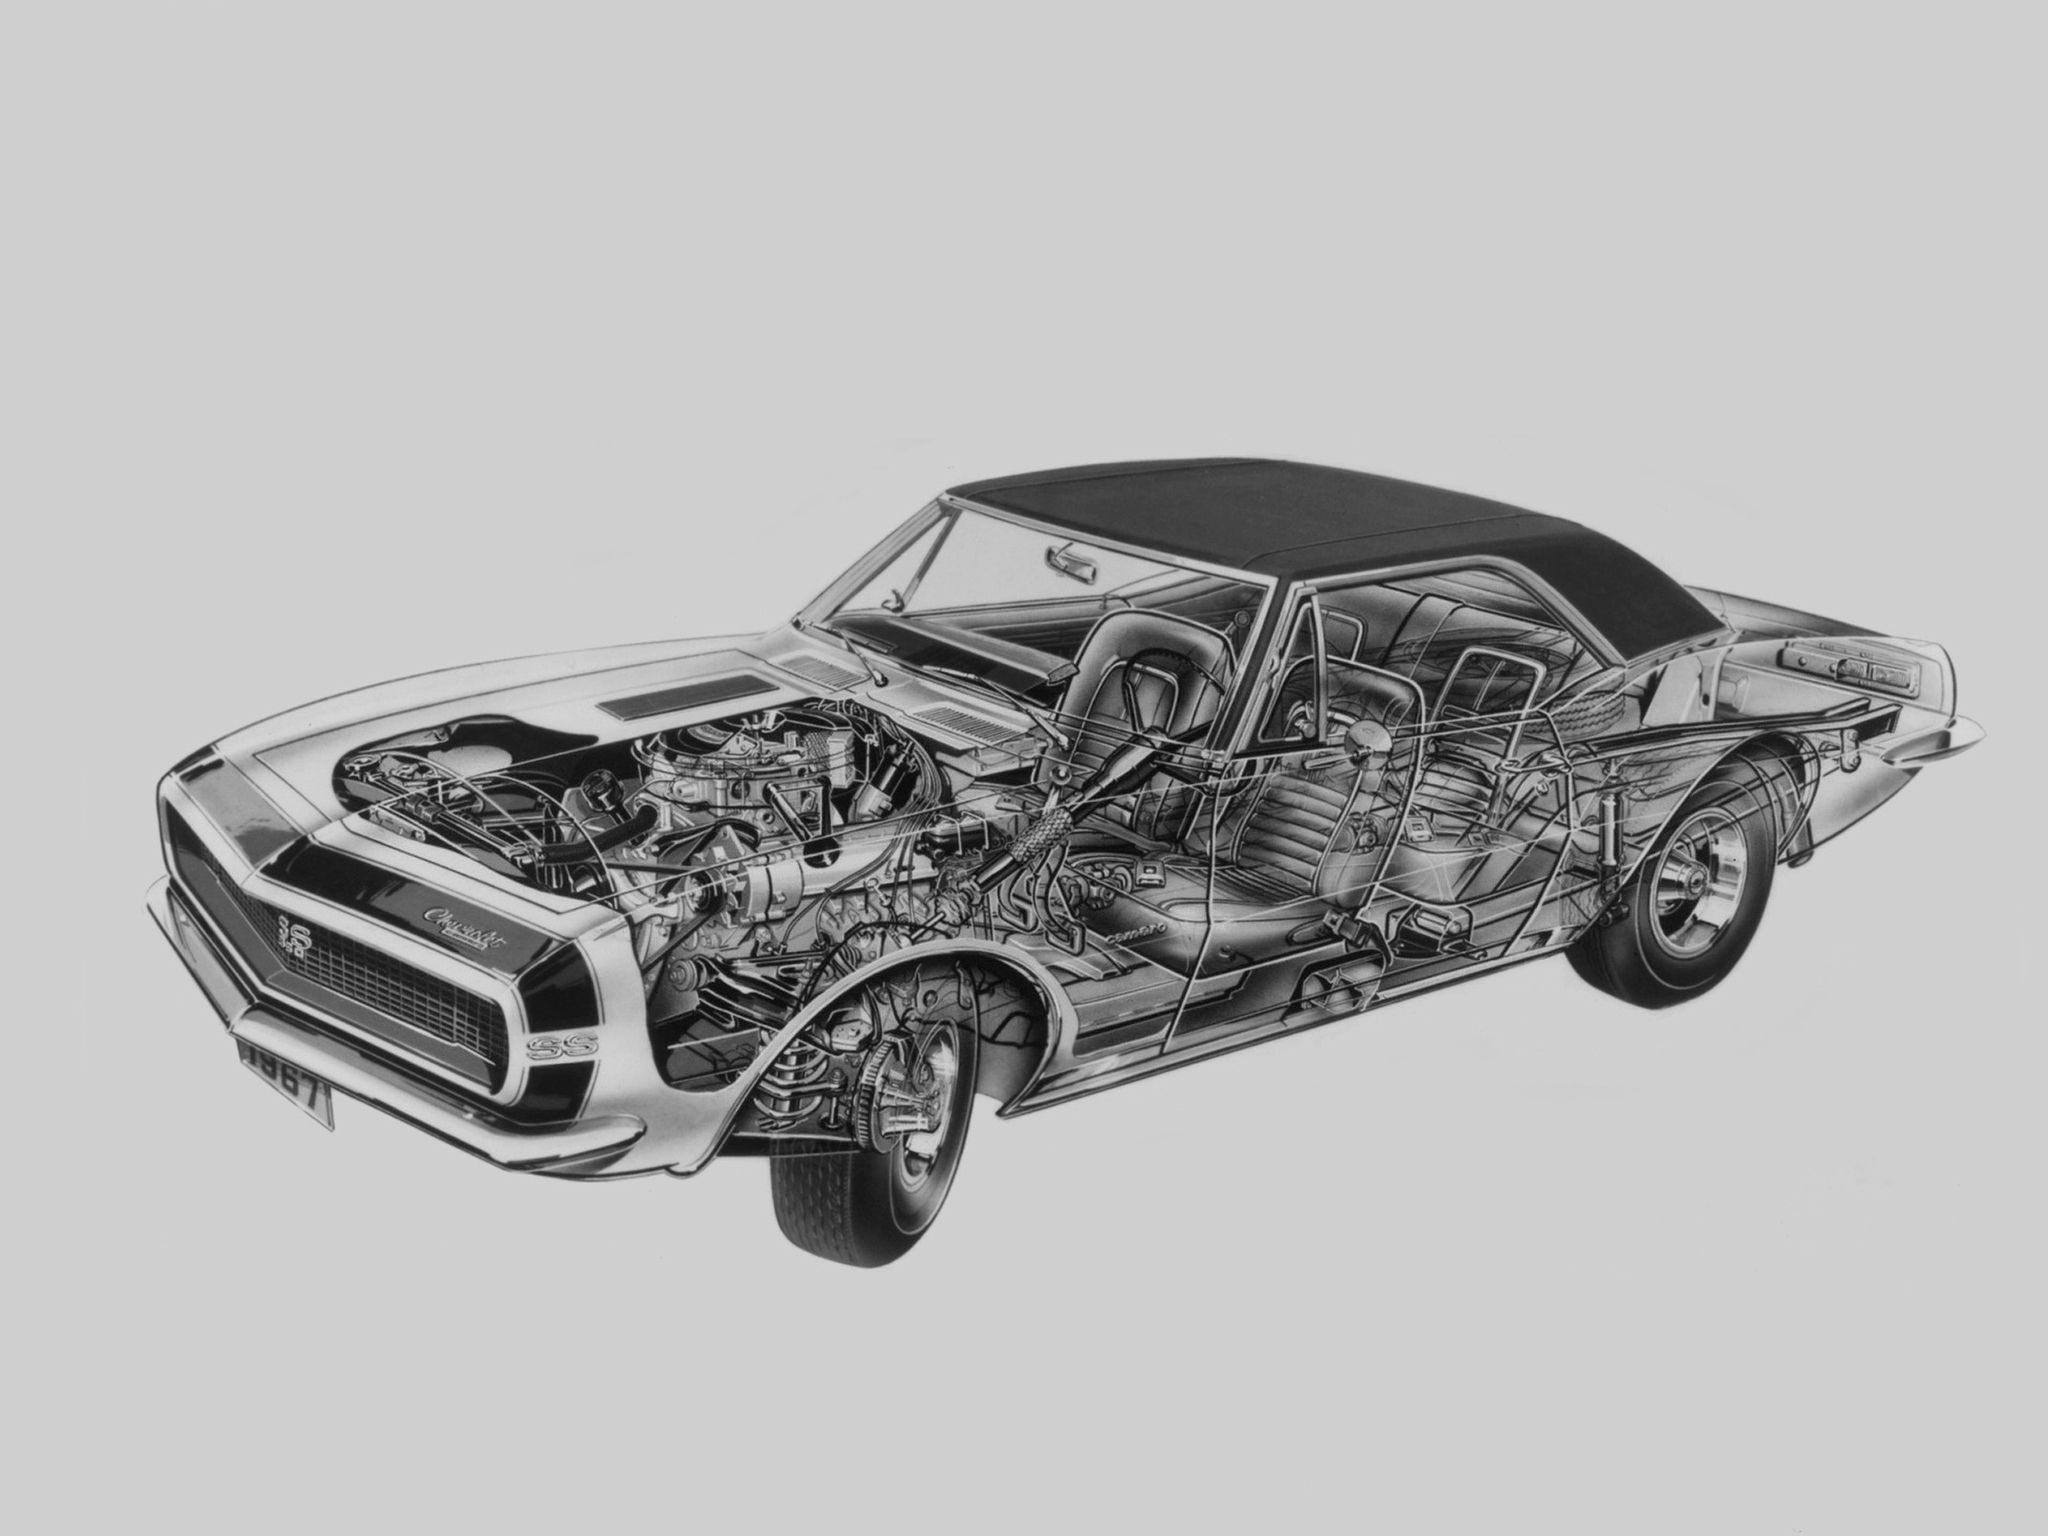 Chevrolet Camaro RS/SS 350 cutaway drawing